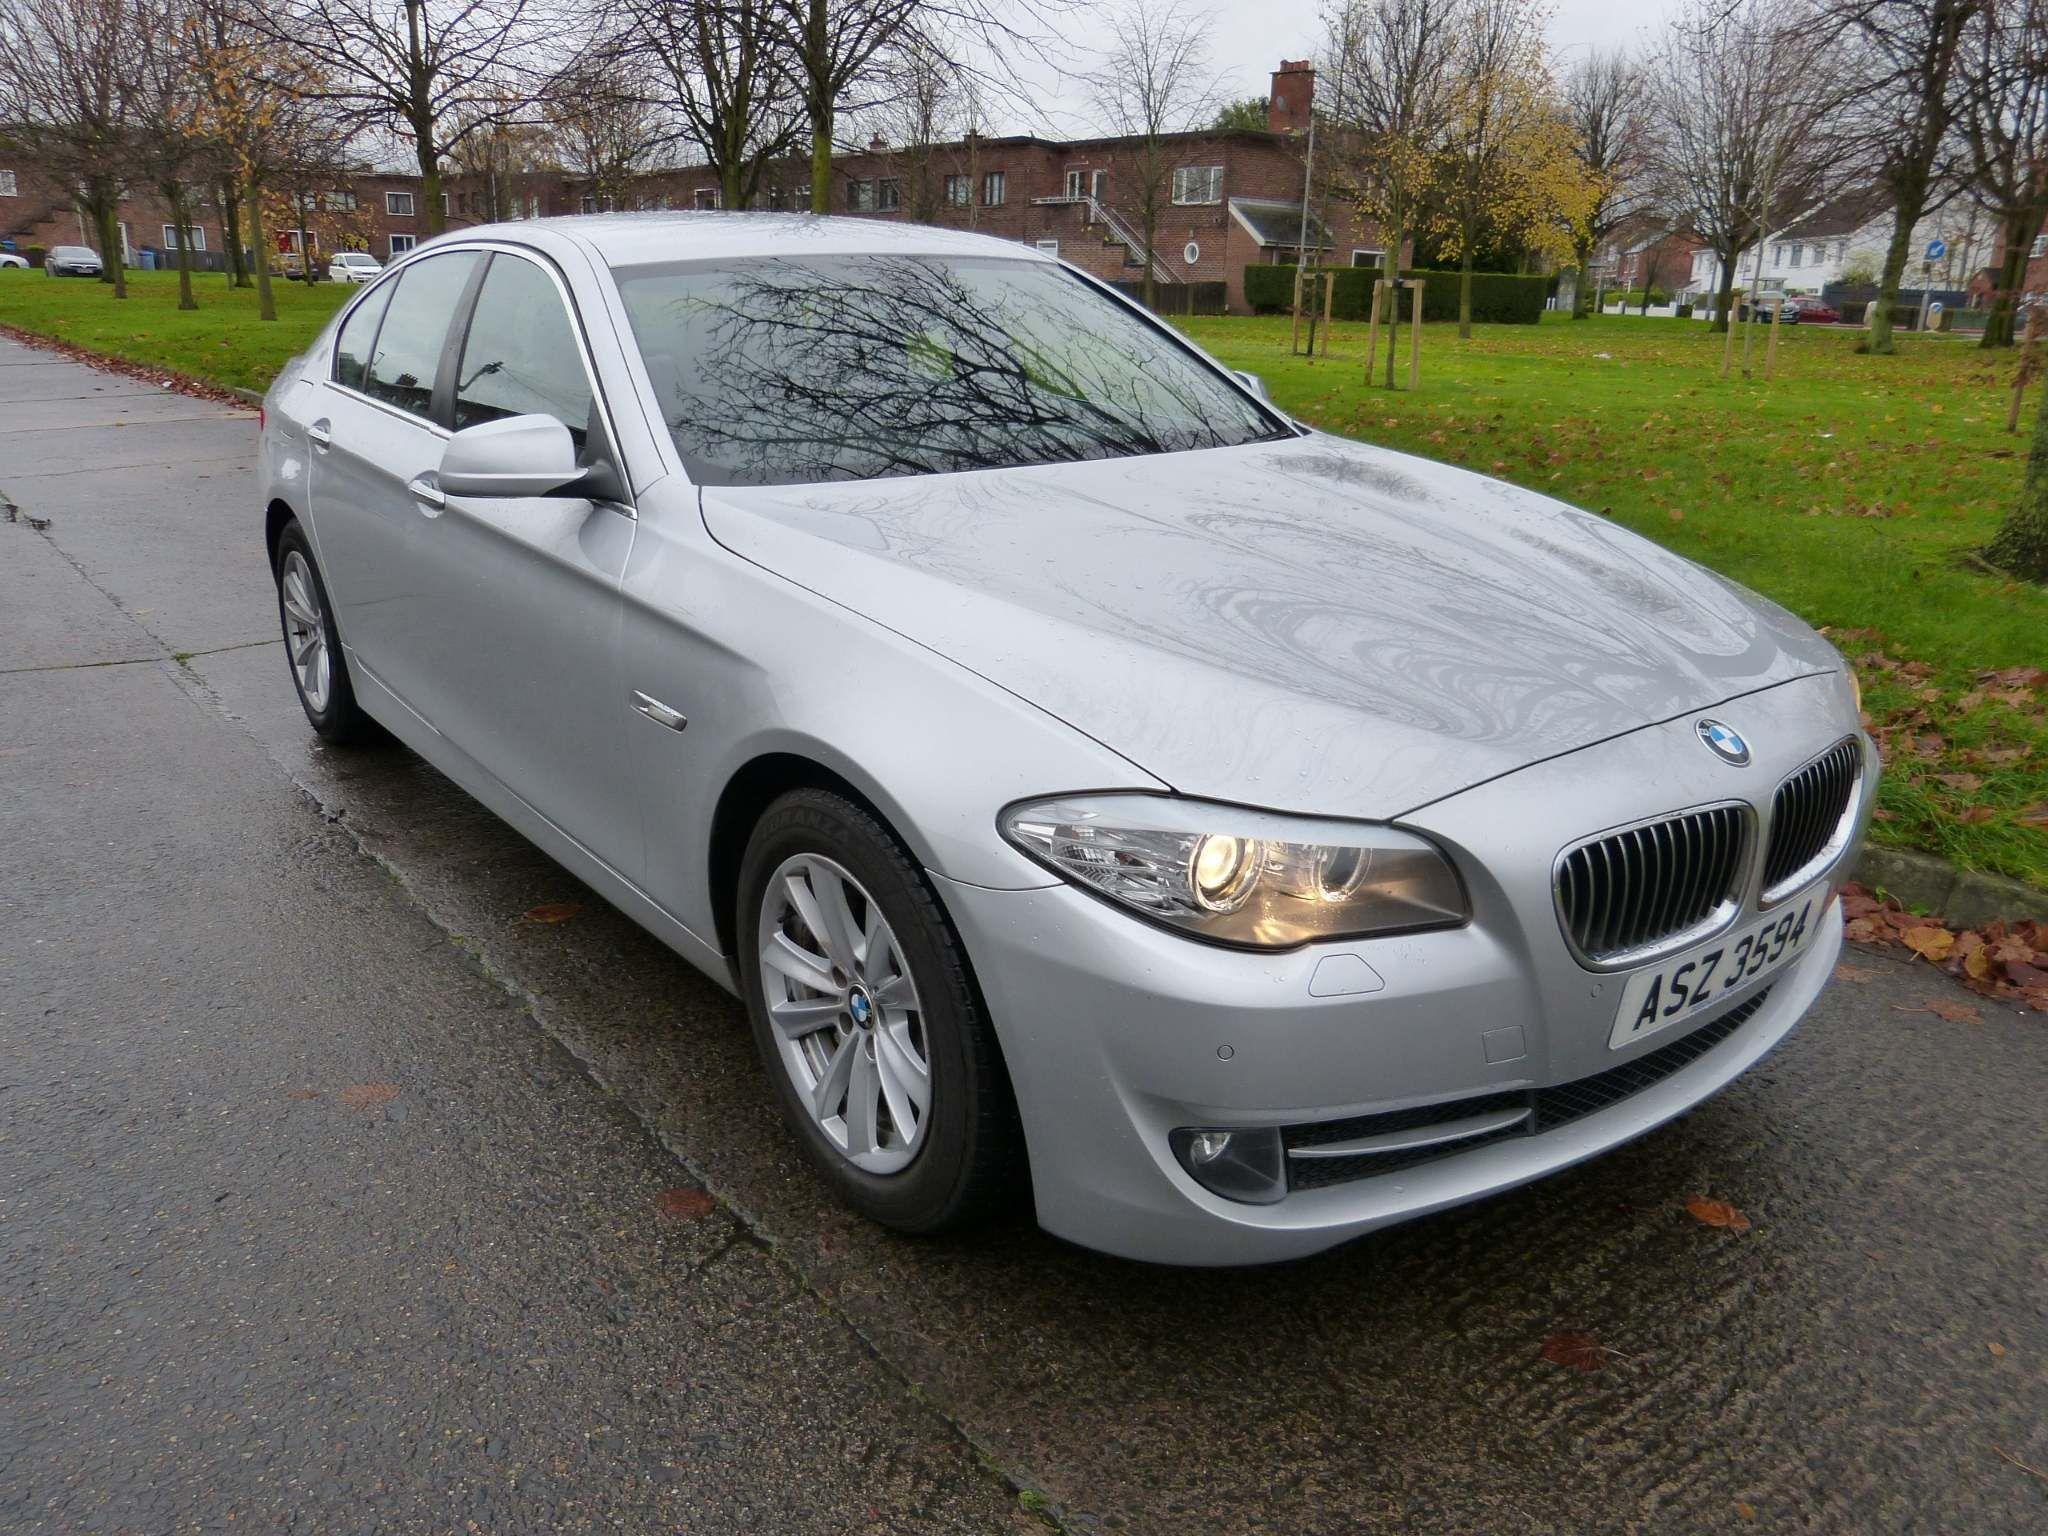 2013 BMW 5 Series 2.0 525d SE Diesel Automatic  – Beechlawn Motors Belfast full